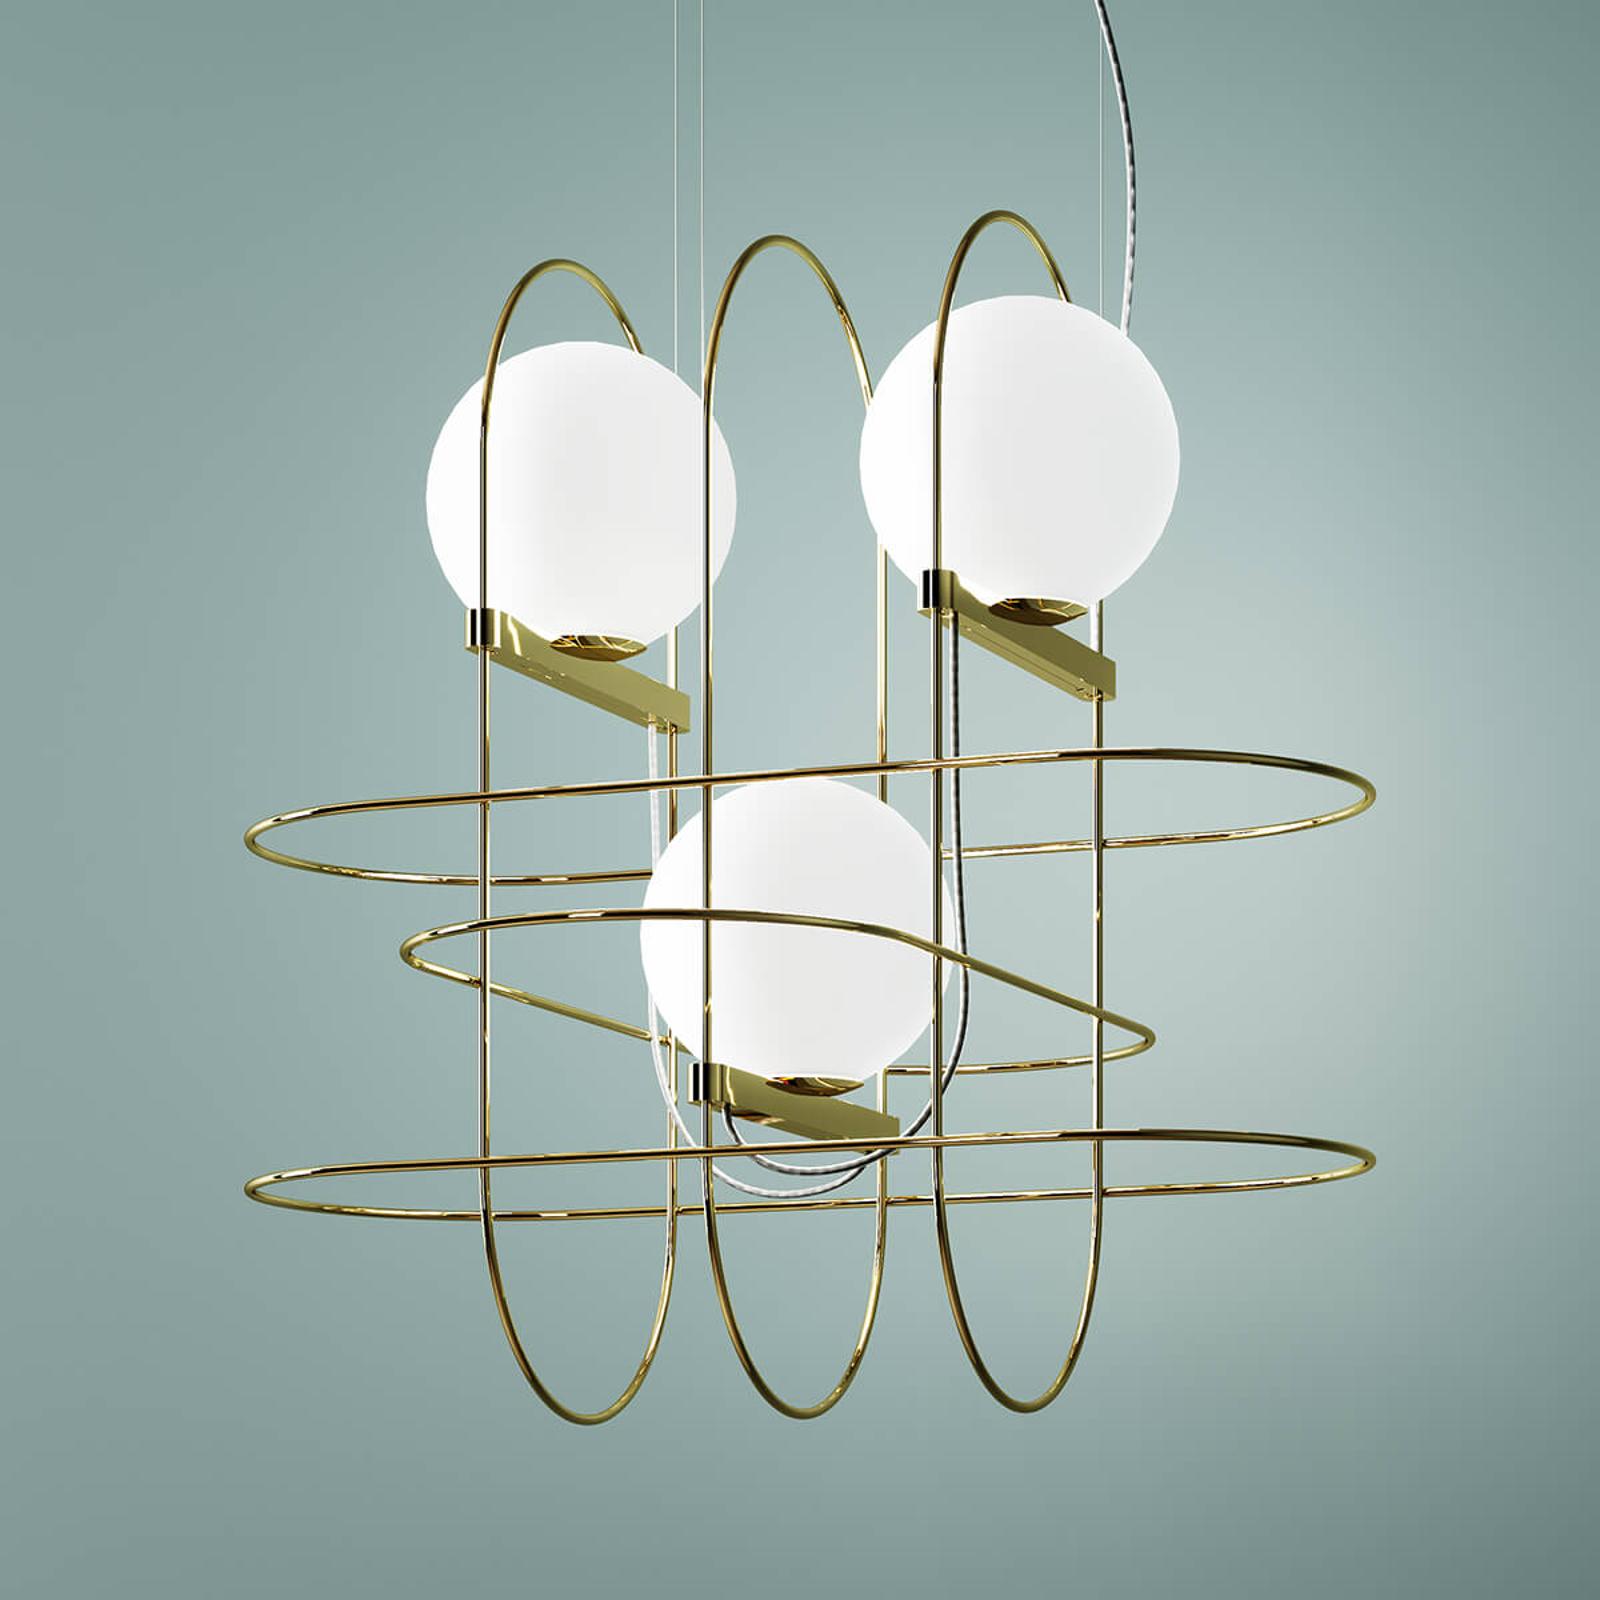 Suspension de designer Setareh avec LED, dorée